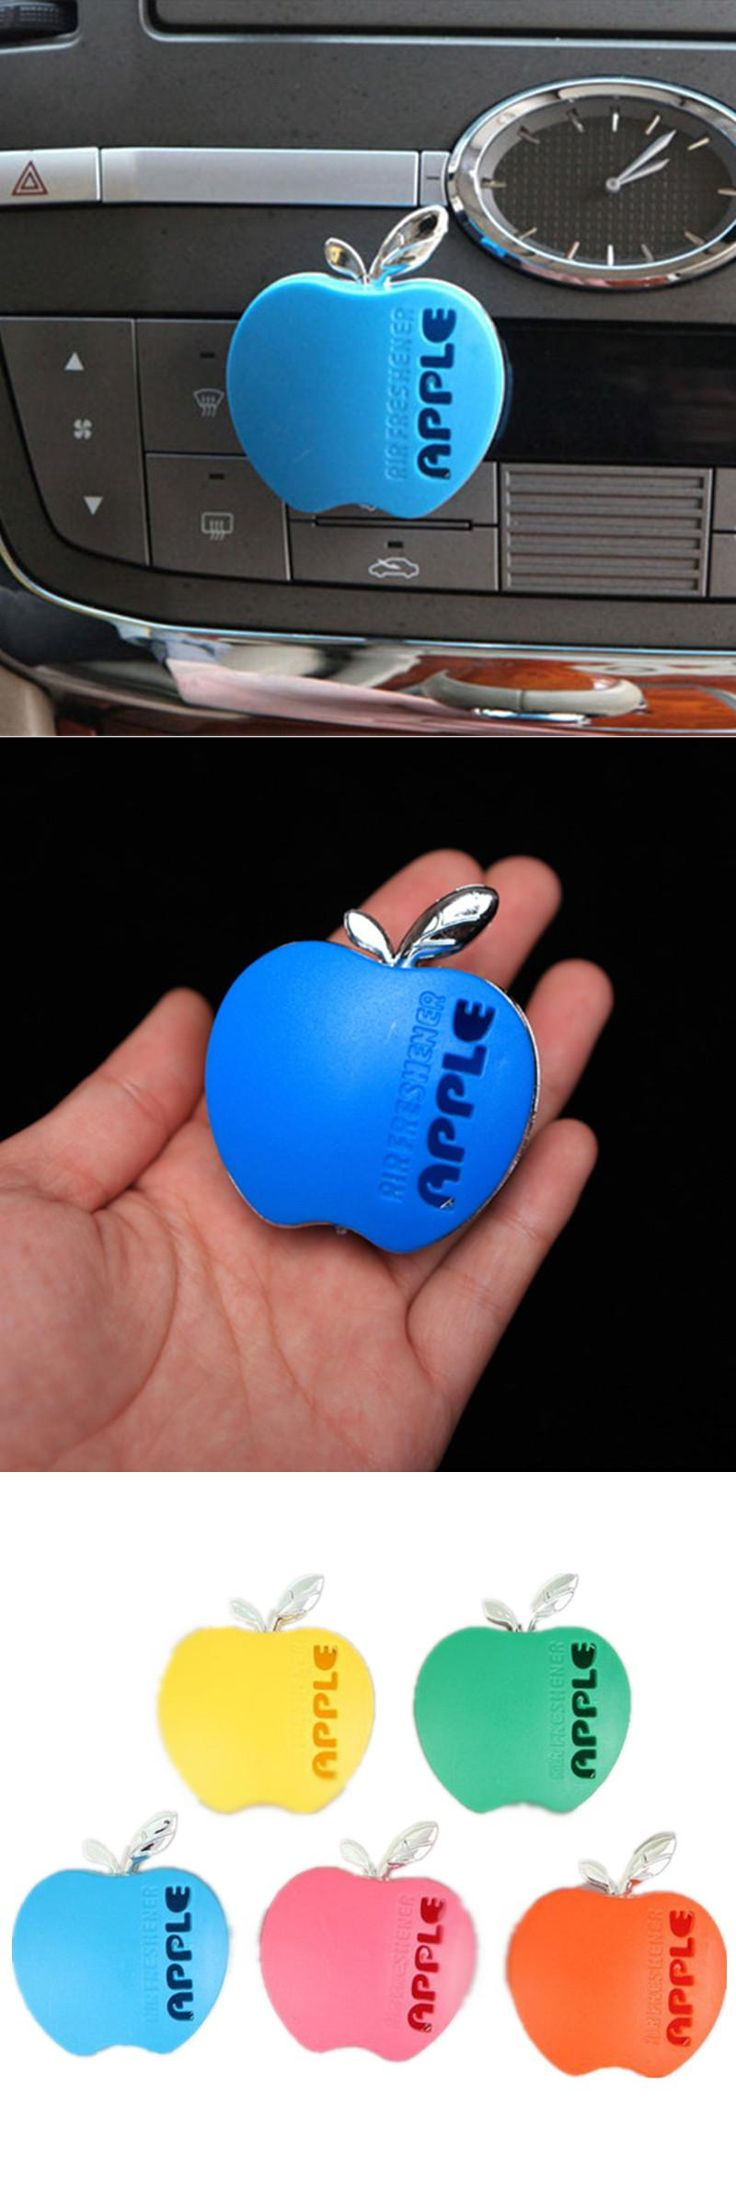 visit to buy car air freshener more flavor apple outlet perfume car perfume car